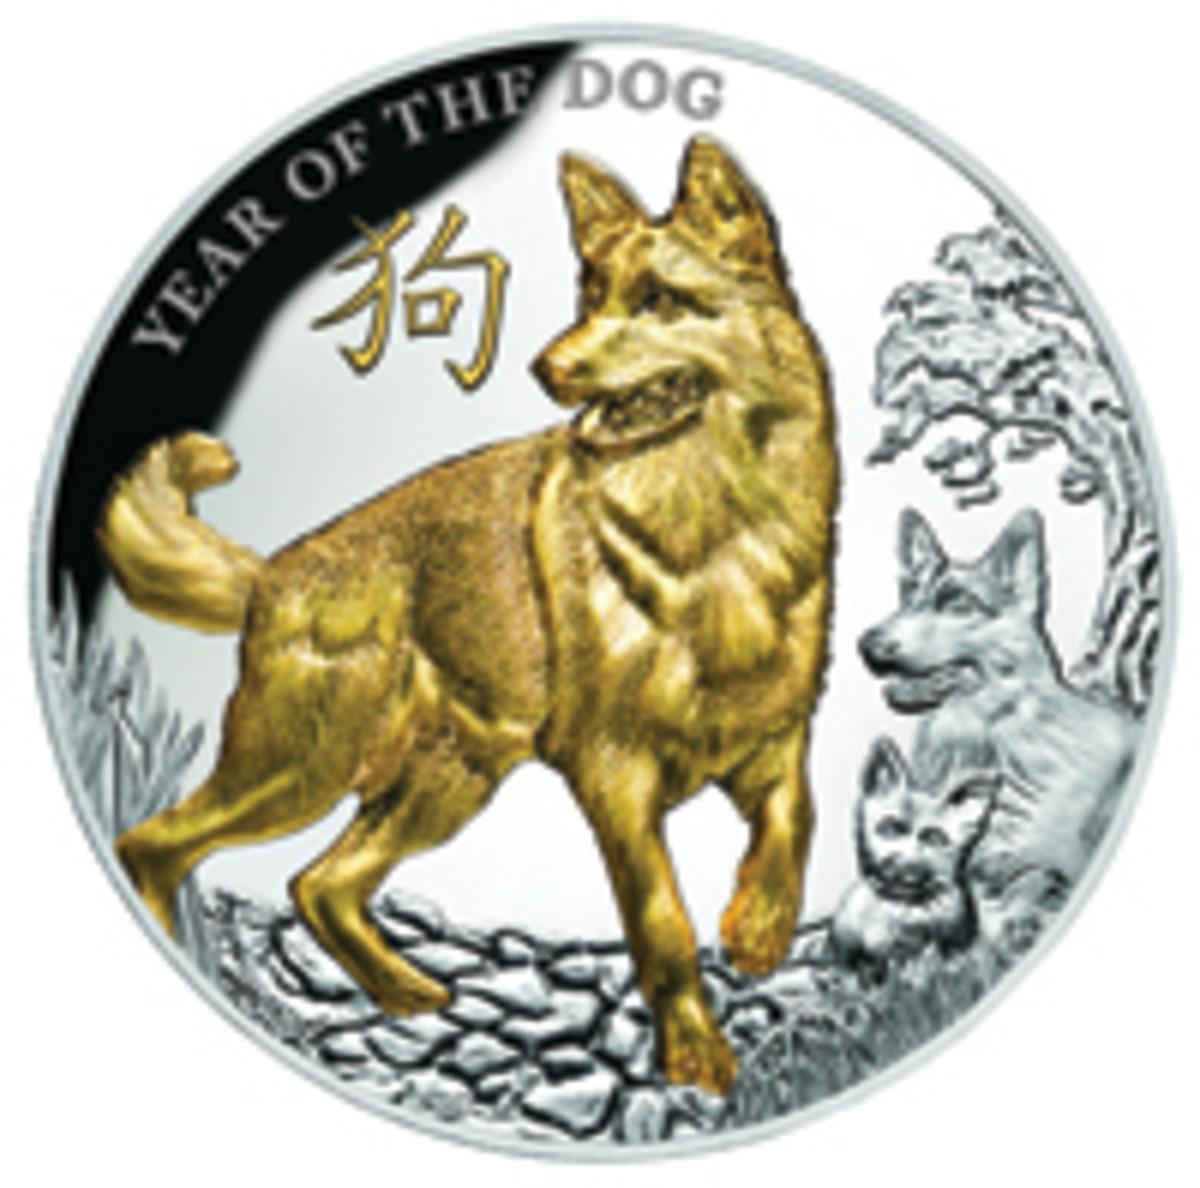 A selectively gold-plated dog dominates Niue's proof $8 struck by Produits Artistiques Métaux Précieux. (Image courtesy www.downies.com)